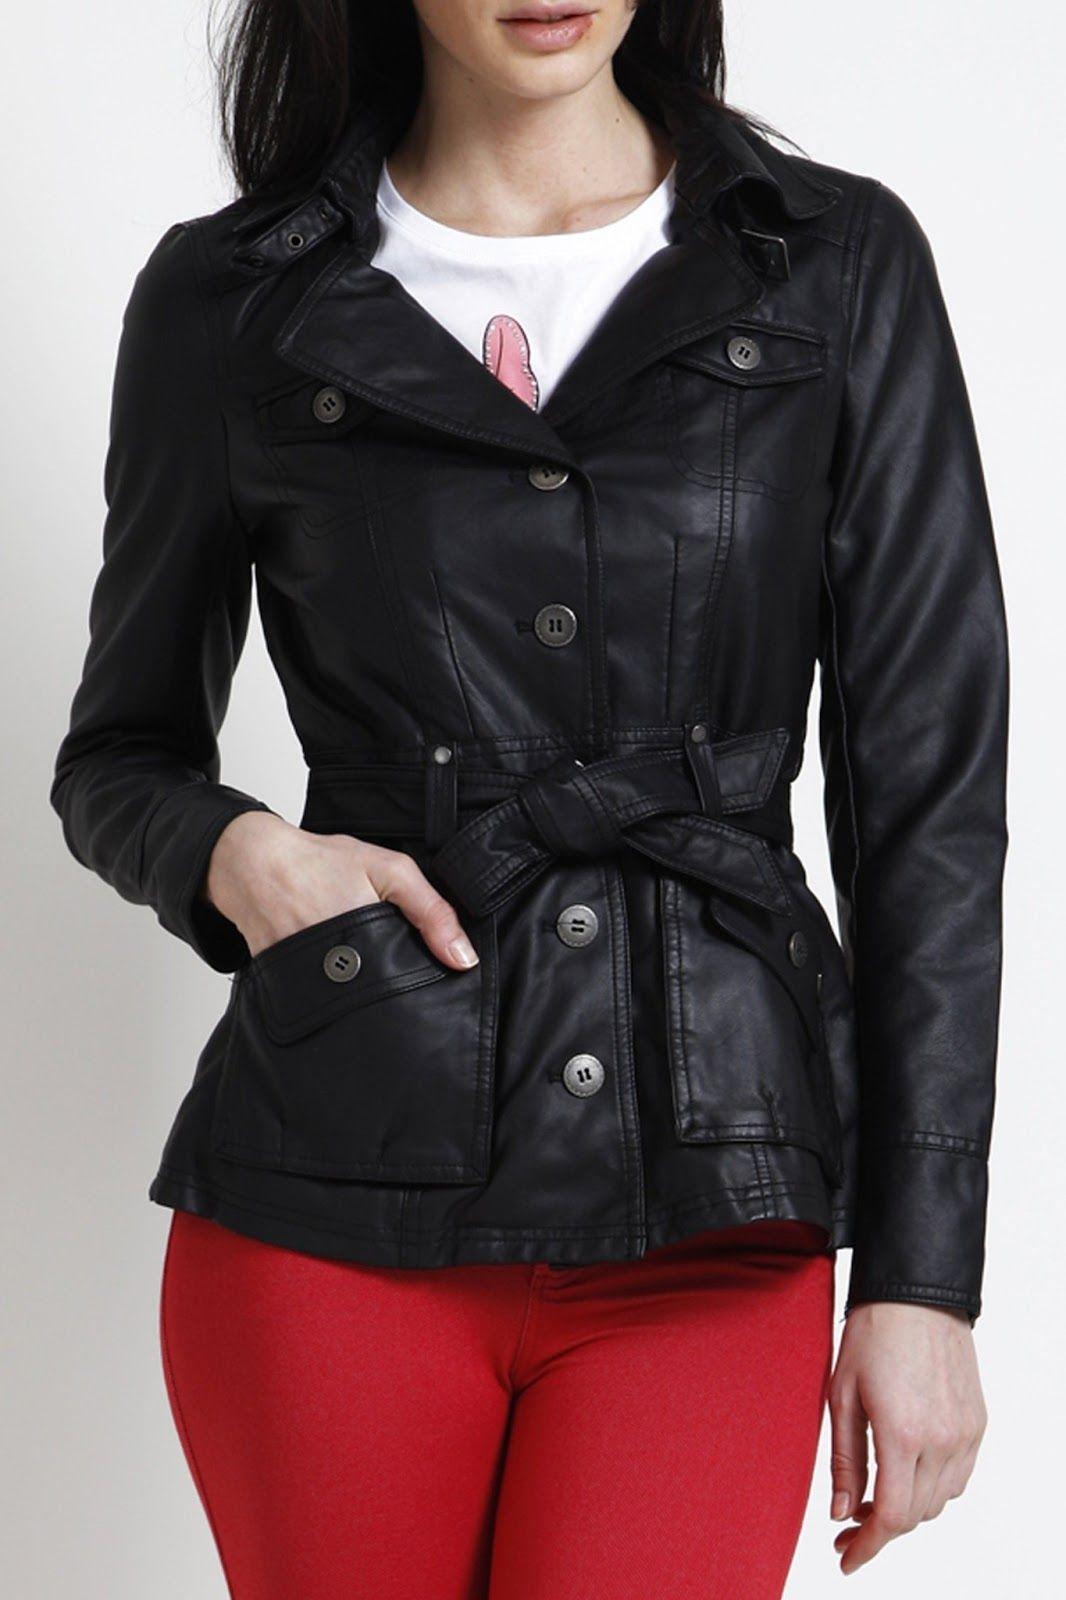 Defacto Ceket Modelleri Moda Spor Giyim Model